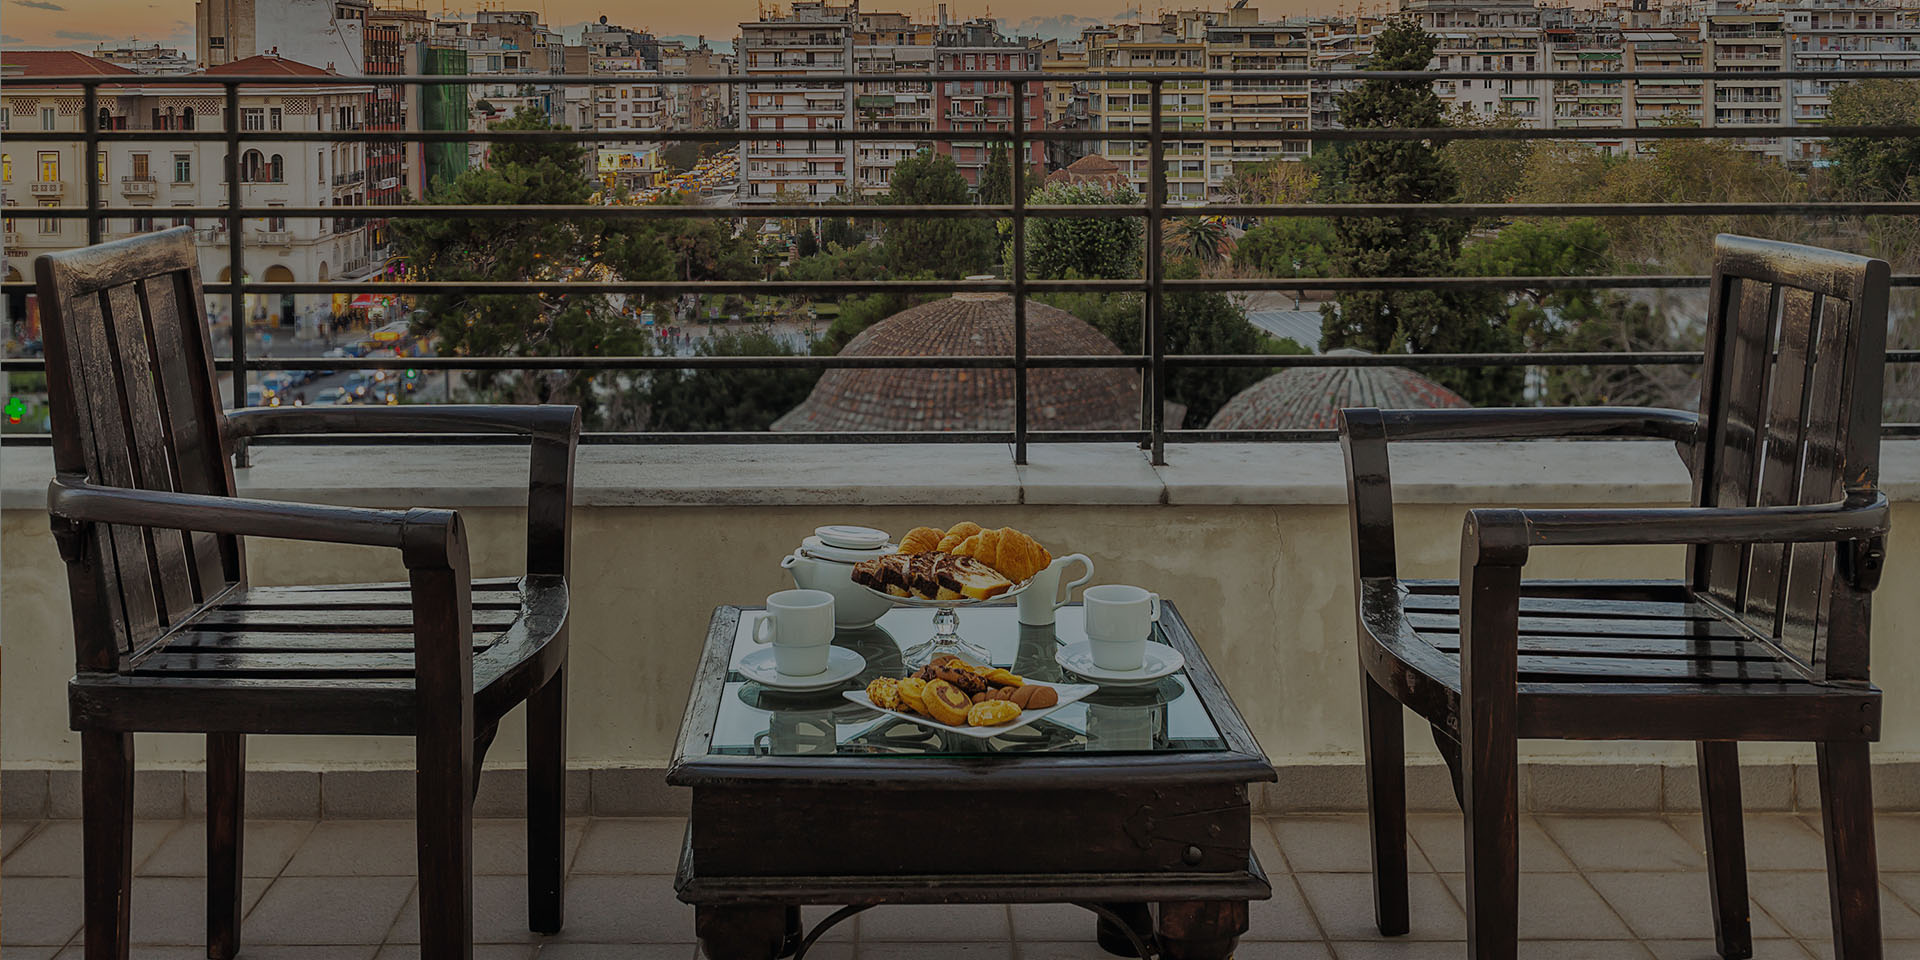 thessaloniki hotels - Aegeon hotels